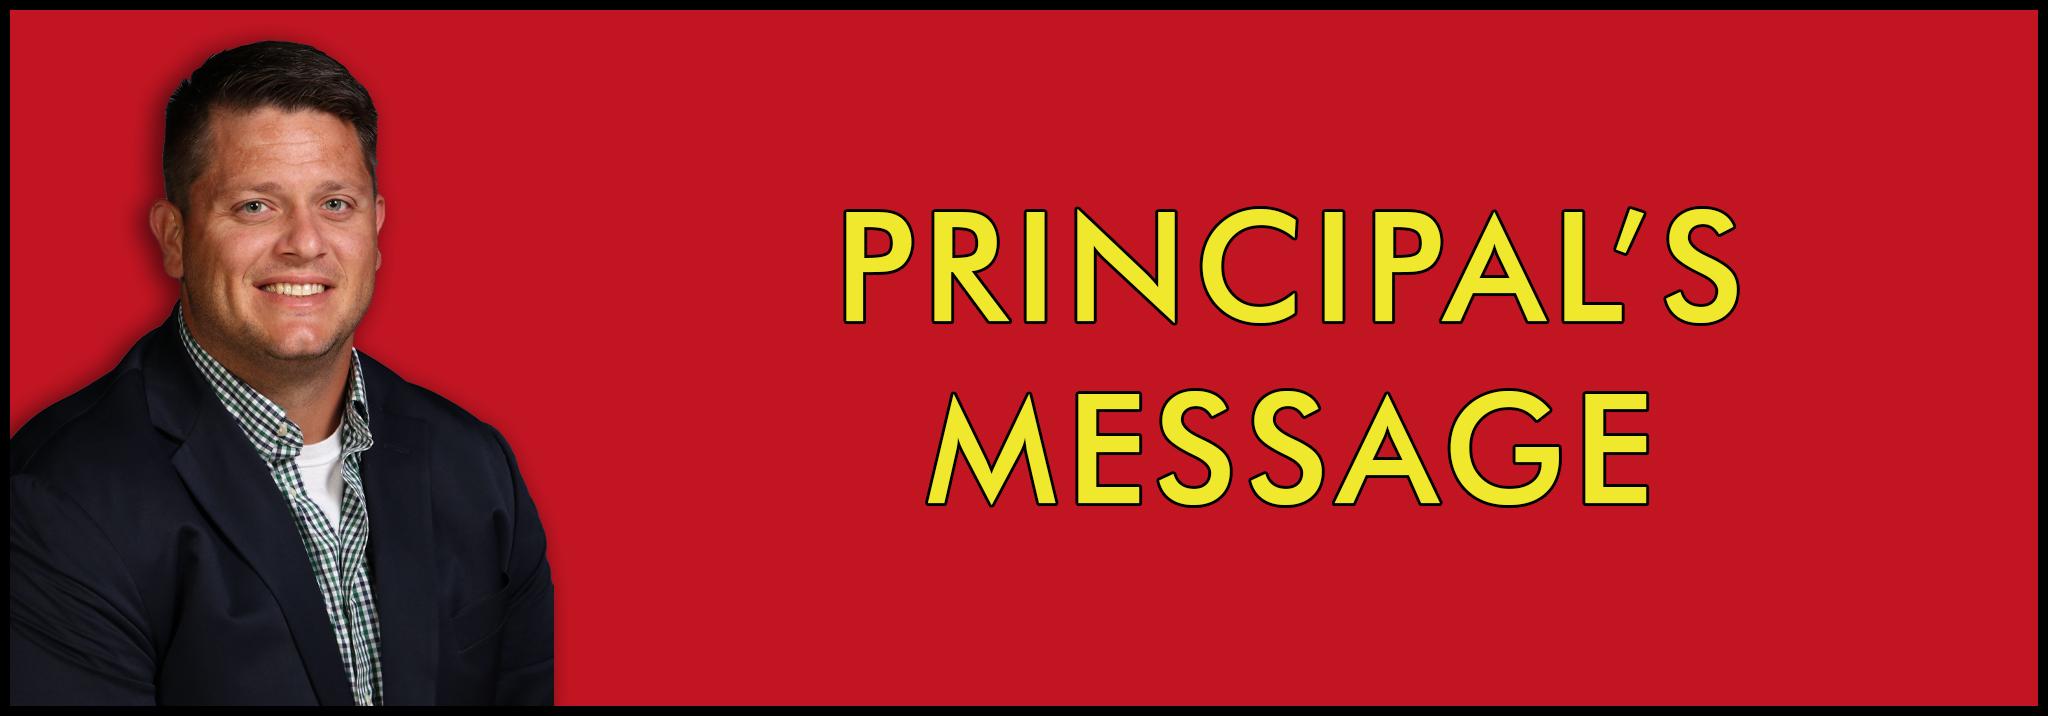 principal message image